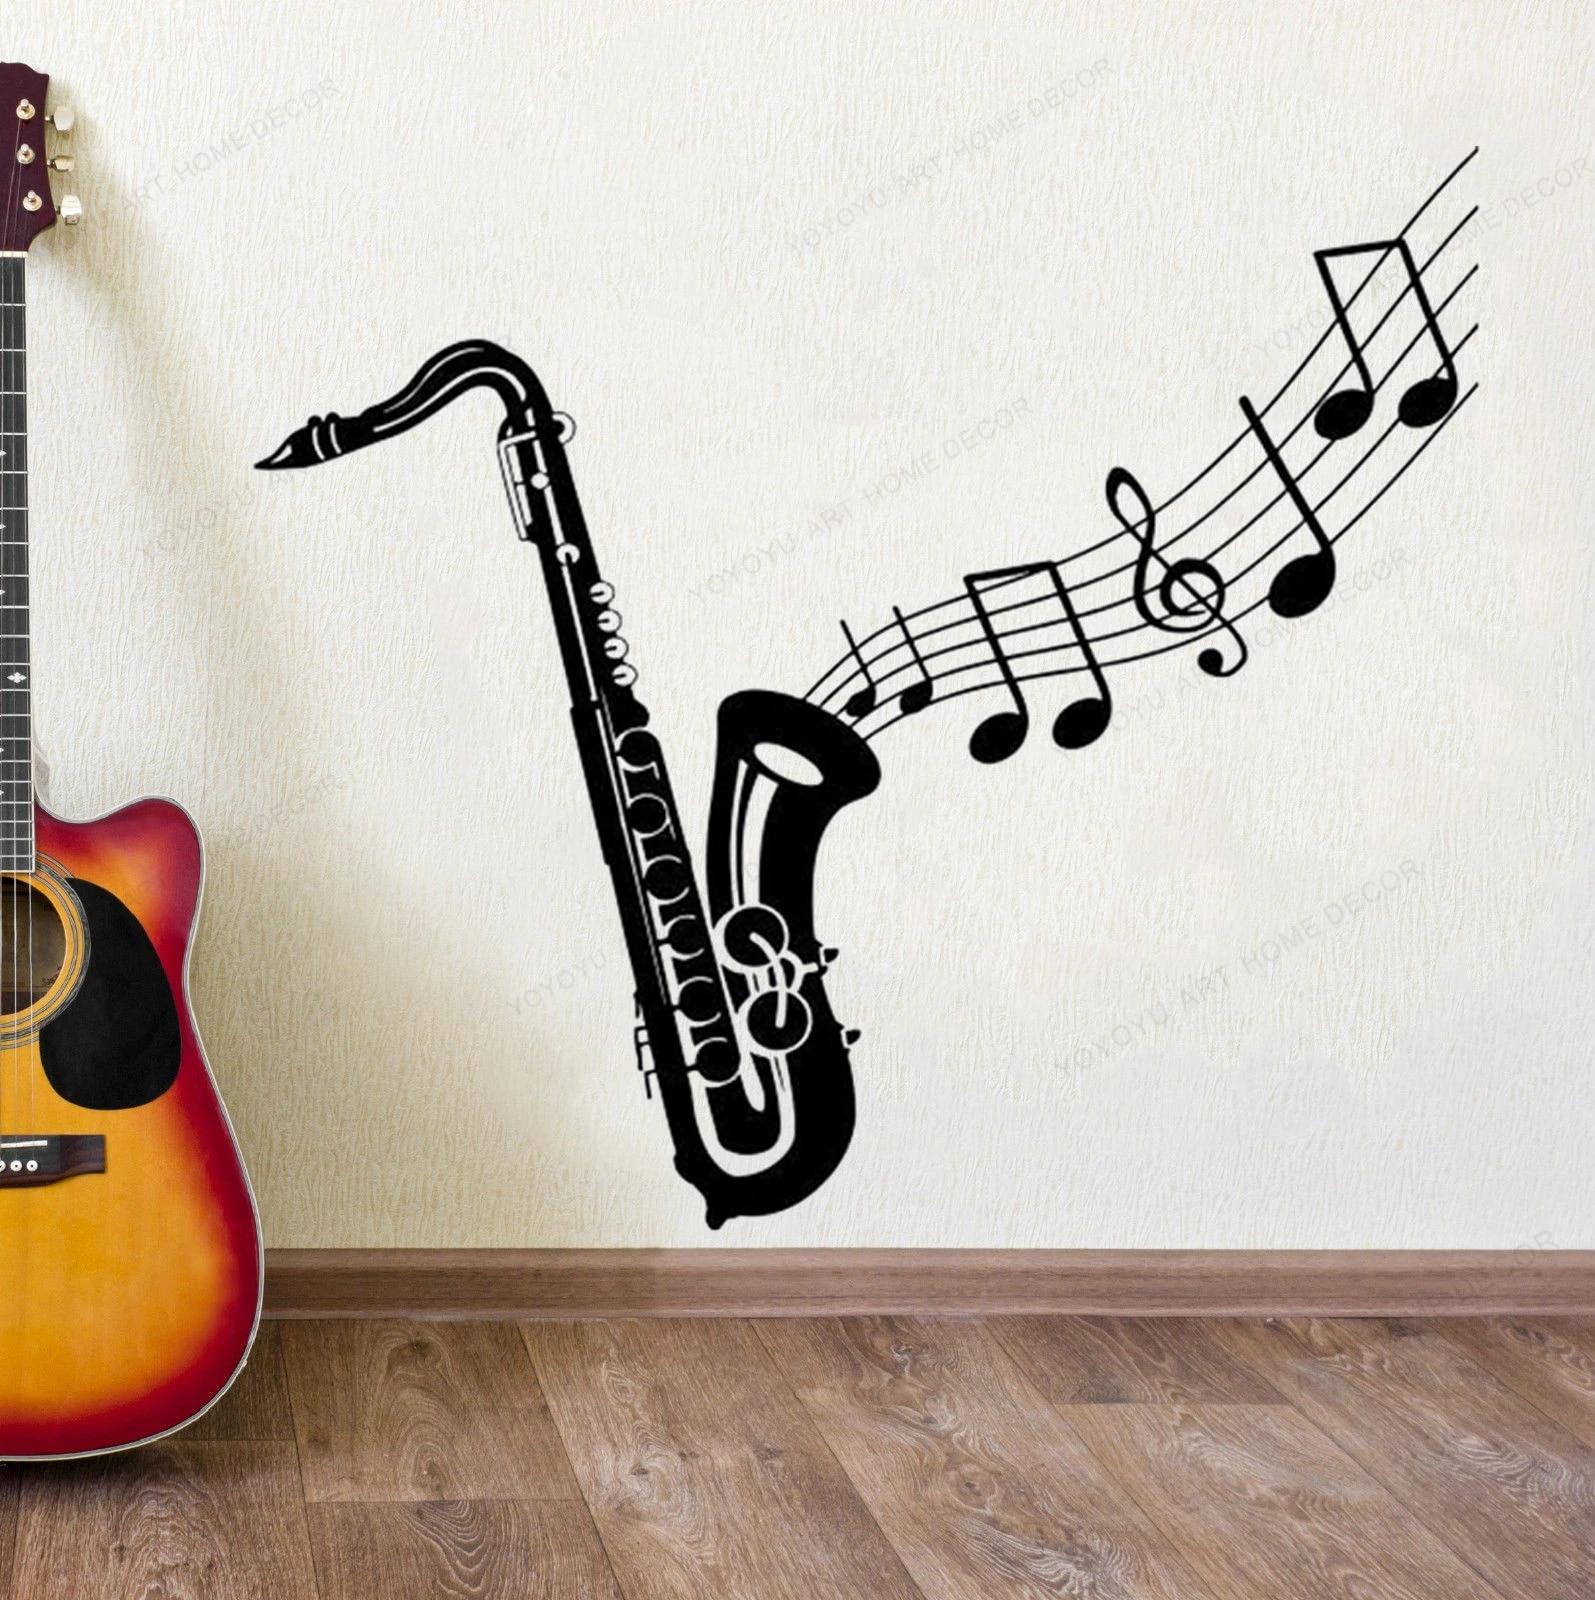 Saxophone Stiker Dinding Vinyl Catatan Musik Dinding Musik Dinding Dekorasi Alat Musik Dinding Seni Mural Hj630 Wall Stickers Aliexpress